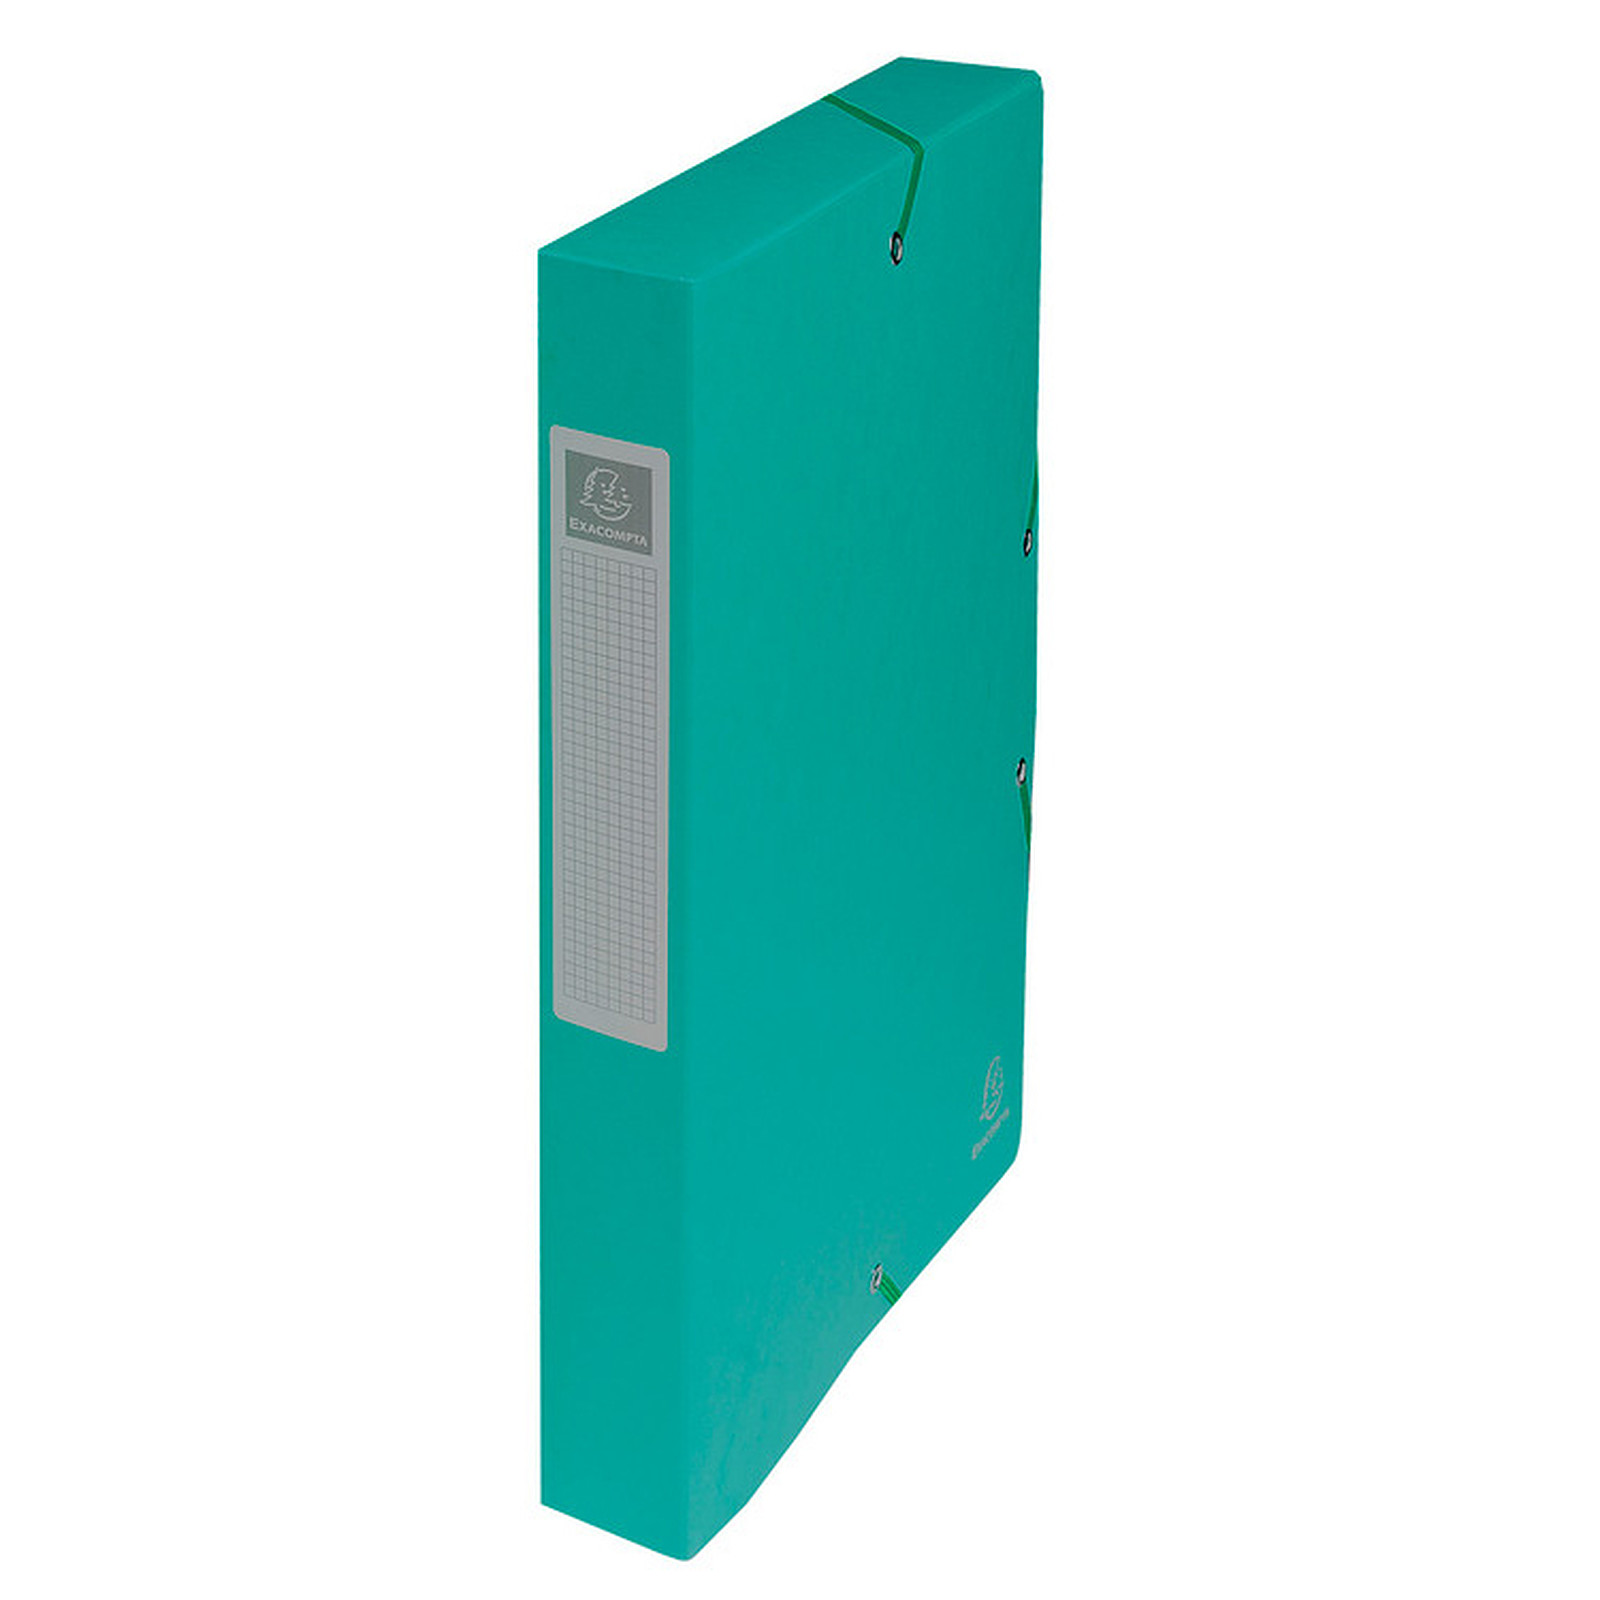 Exacompta Cajas de archivo Fondo Exabox 40 mm Verde x 8